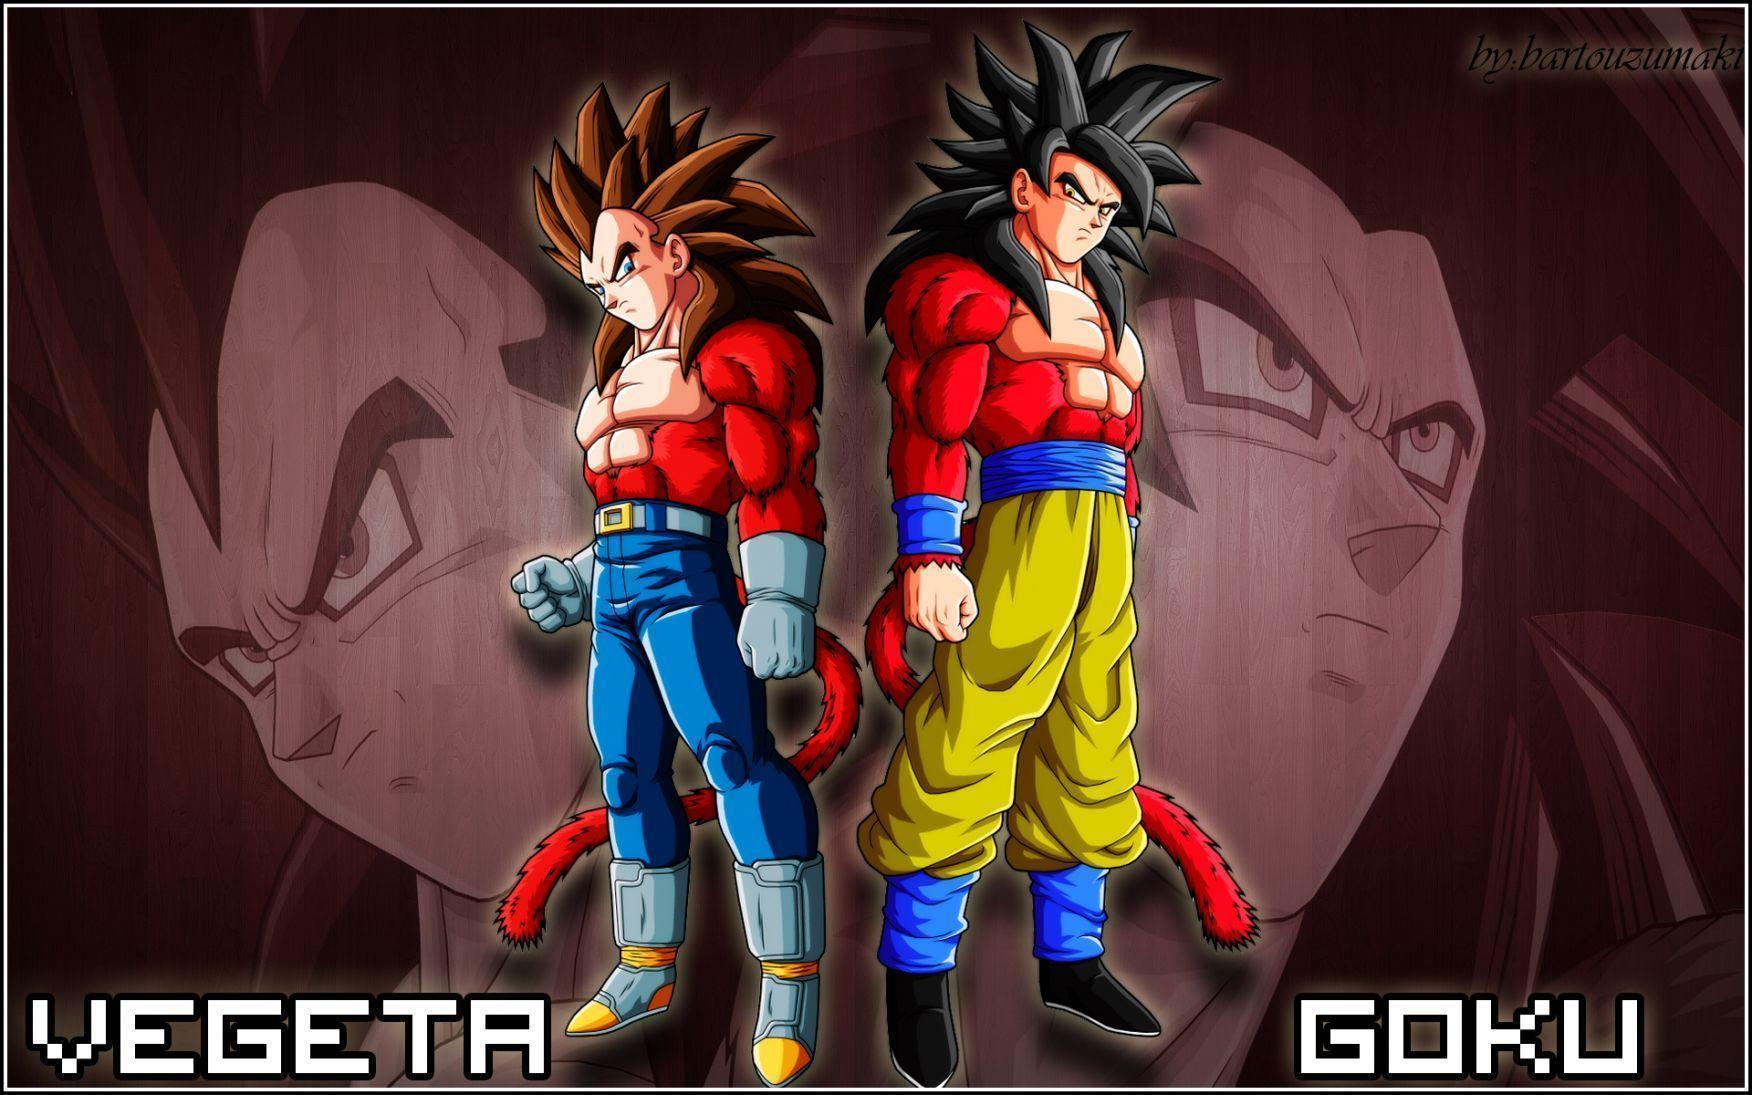 Goku Vegeta SSJ4 Wallpapers